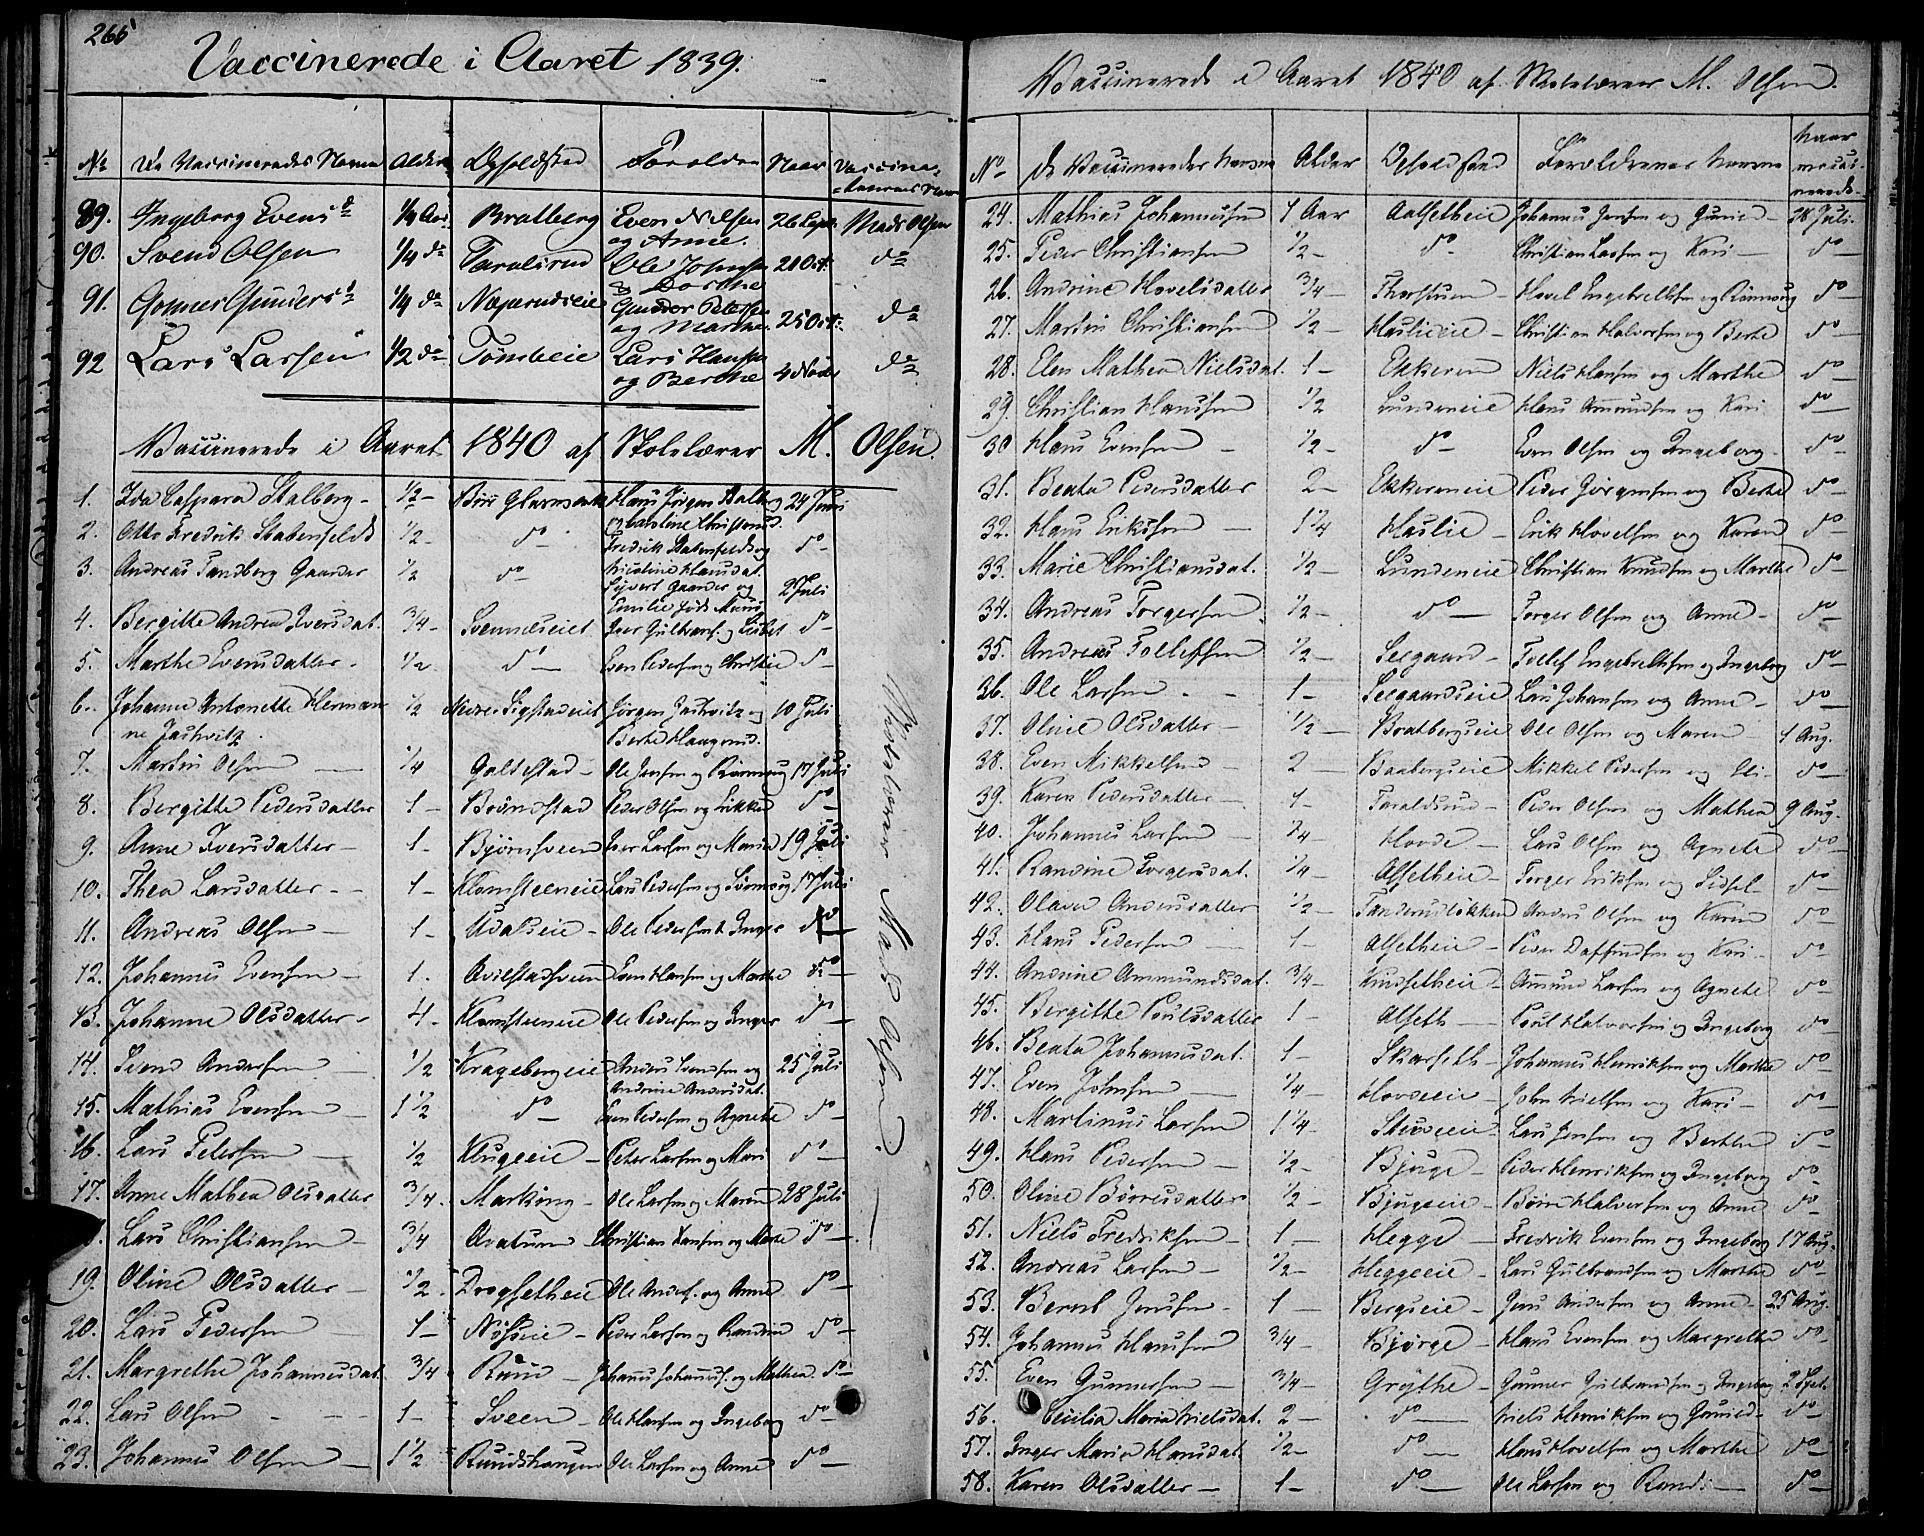 SAH, Biri prestekontor, Ministerialbok nr. 4, 1829-1842, s. 265